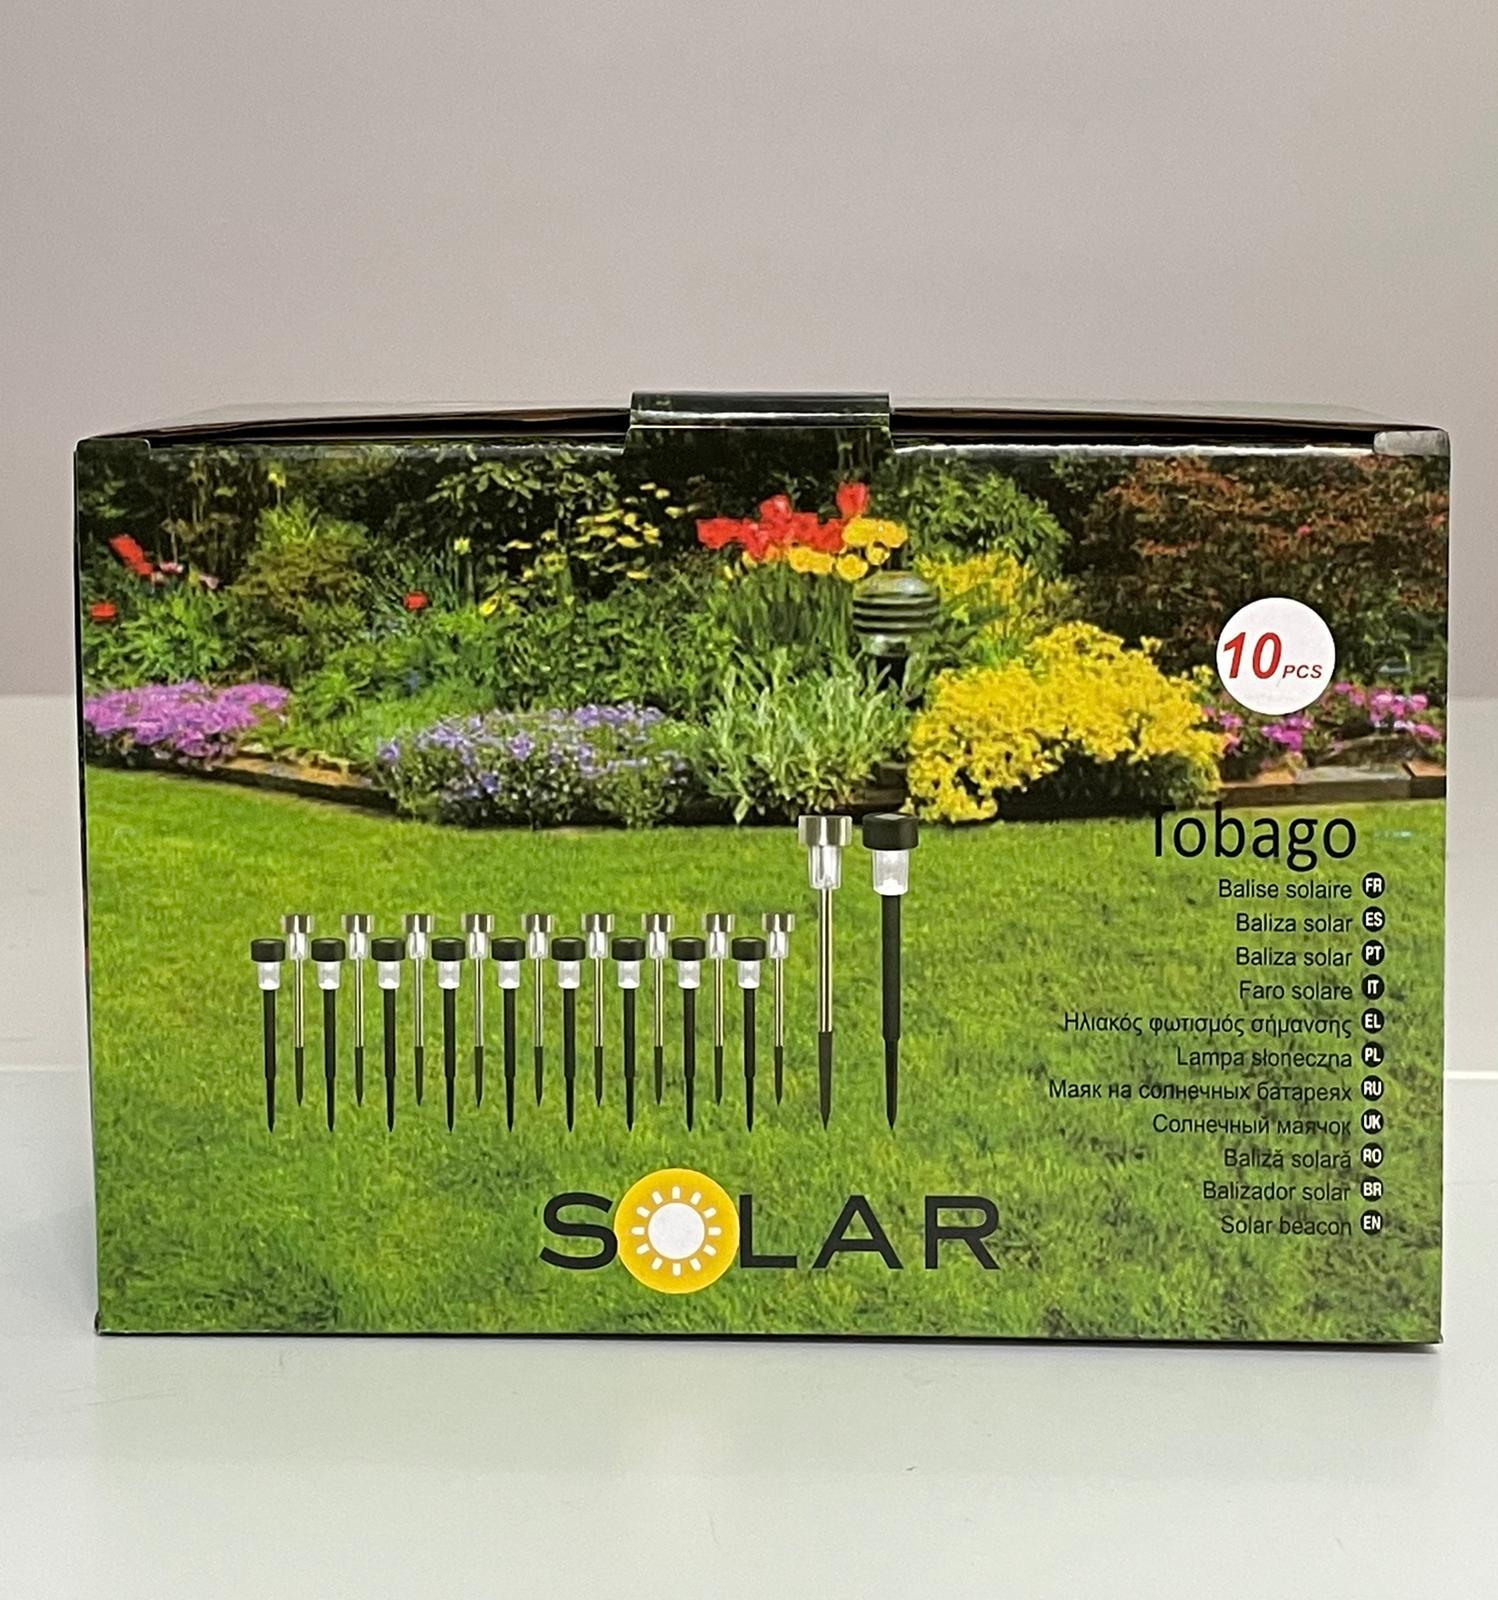 Lampa solara stick inox, H 36 cm, set 10 bucati